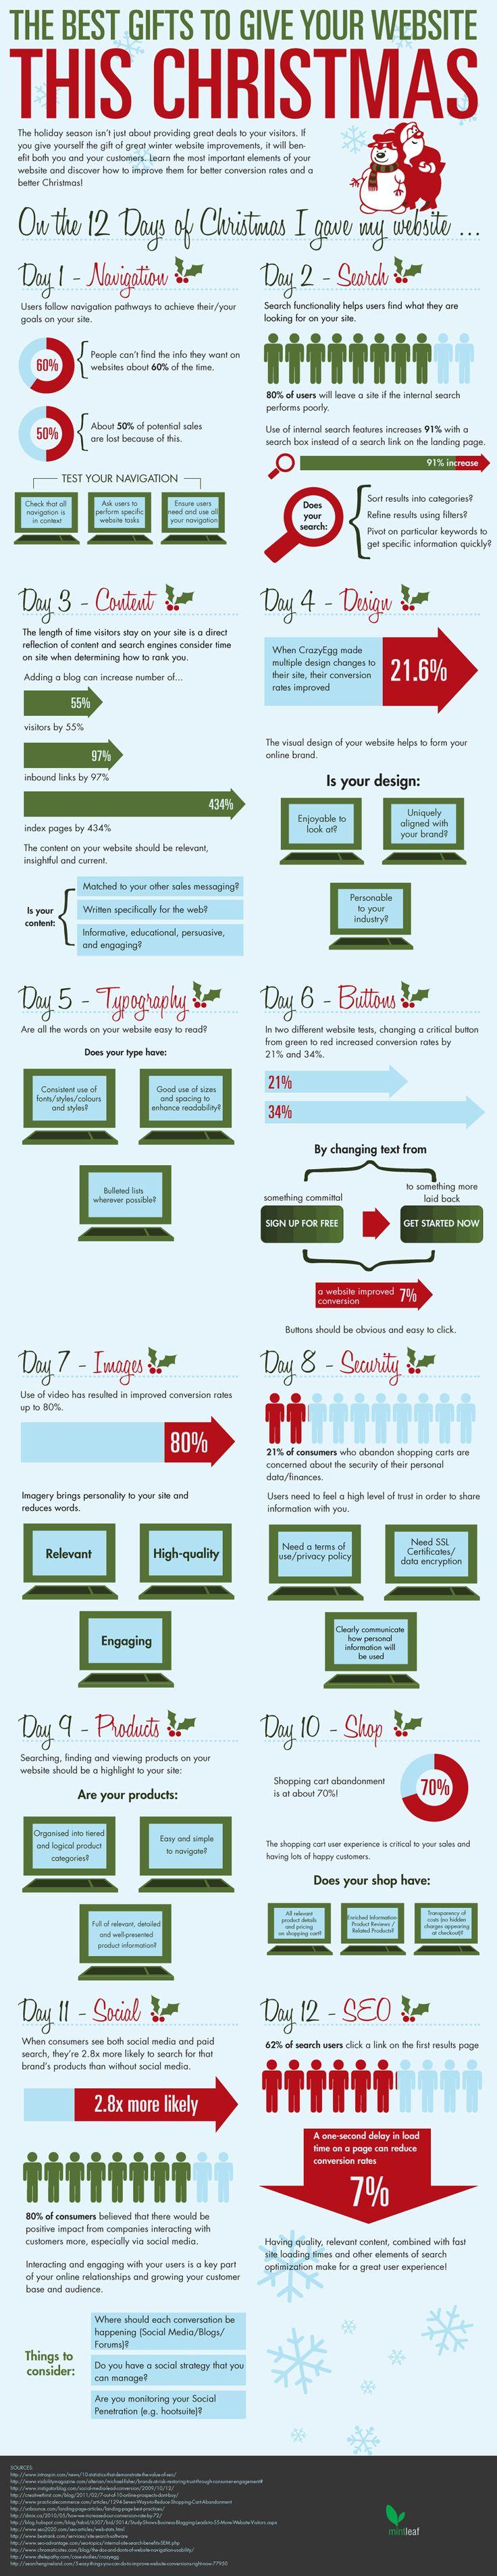 44 best Internet Marketing, SMM images on Pinterest | Social media ...